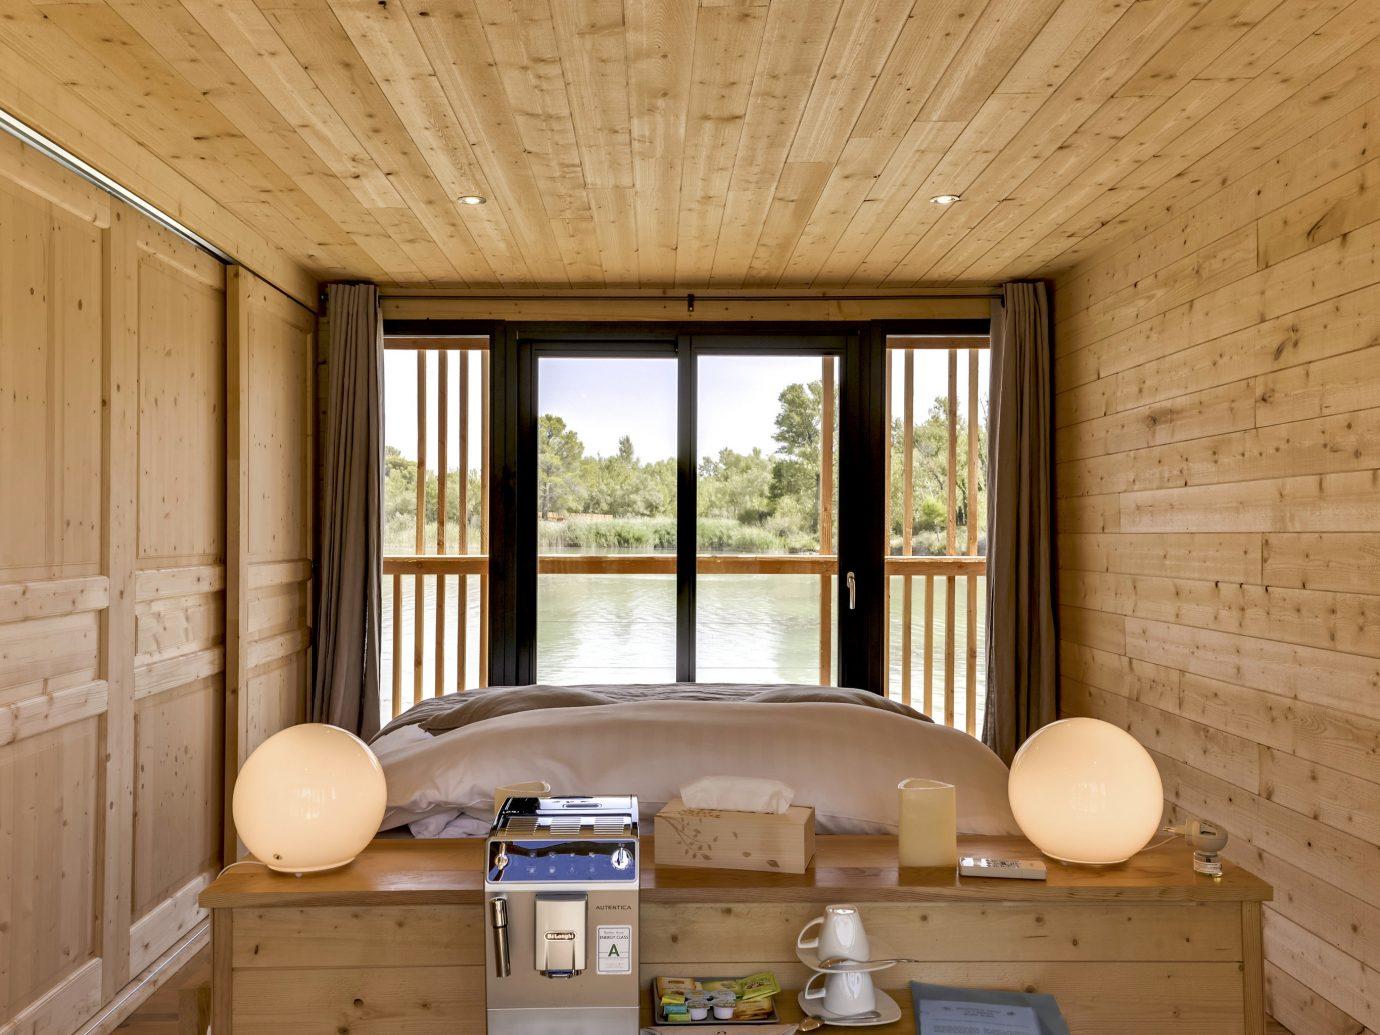 Hotels News Offbeat indoor room ceiling Architecture house wood home interior design real estate window daylighting log cabin floor wood stain wood flooring estate hardwood furniture